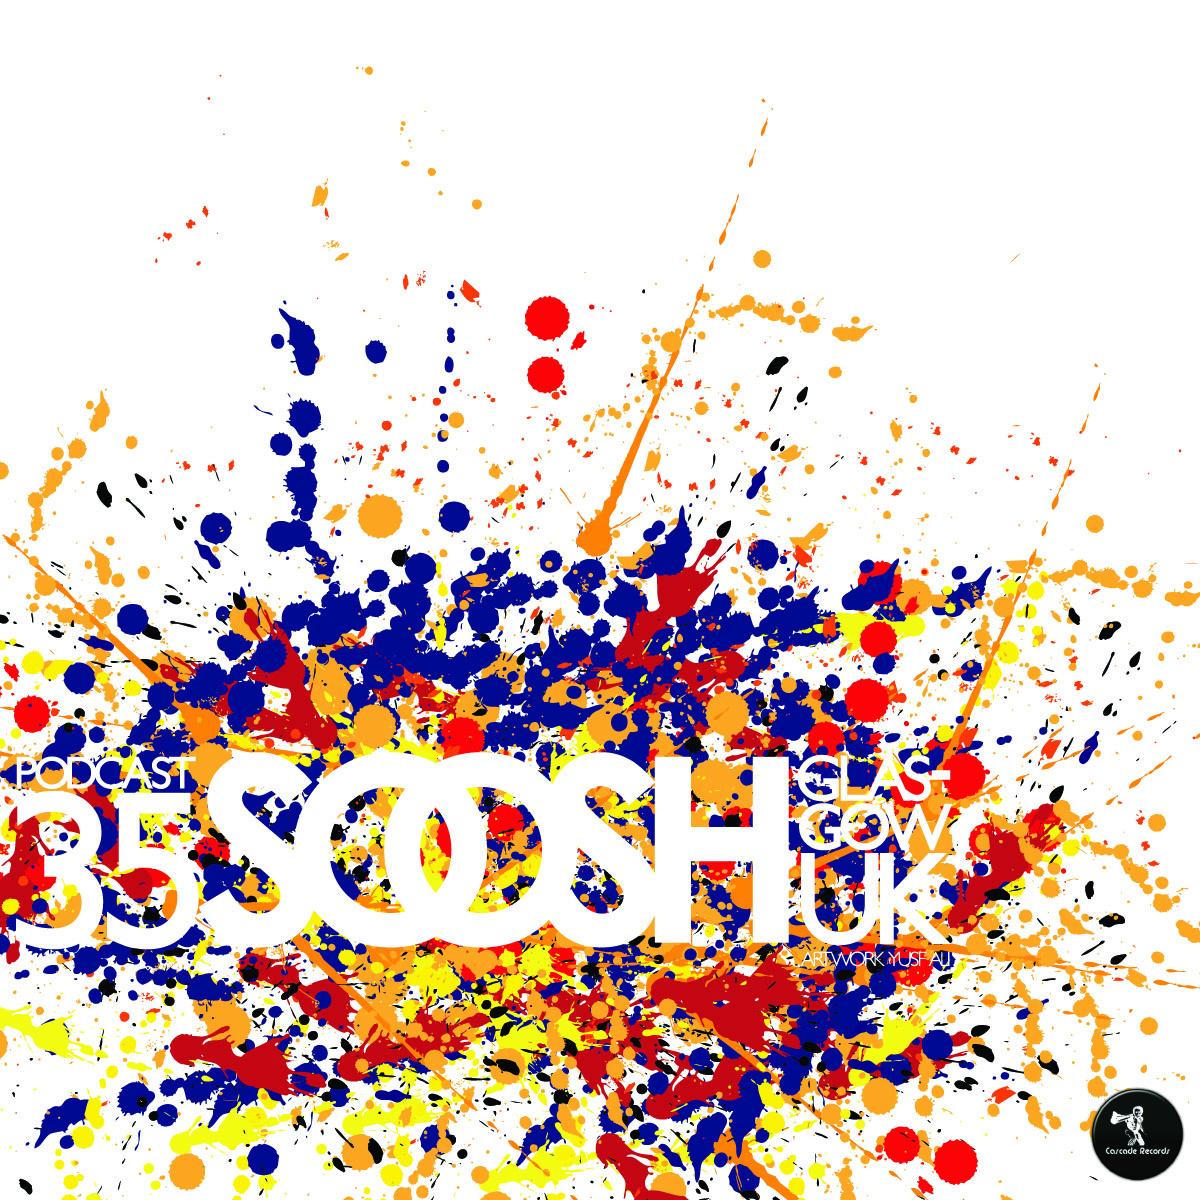 soosh artwork 01 l